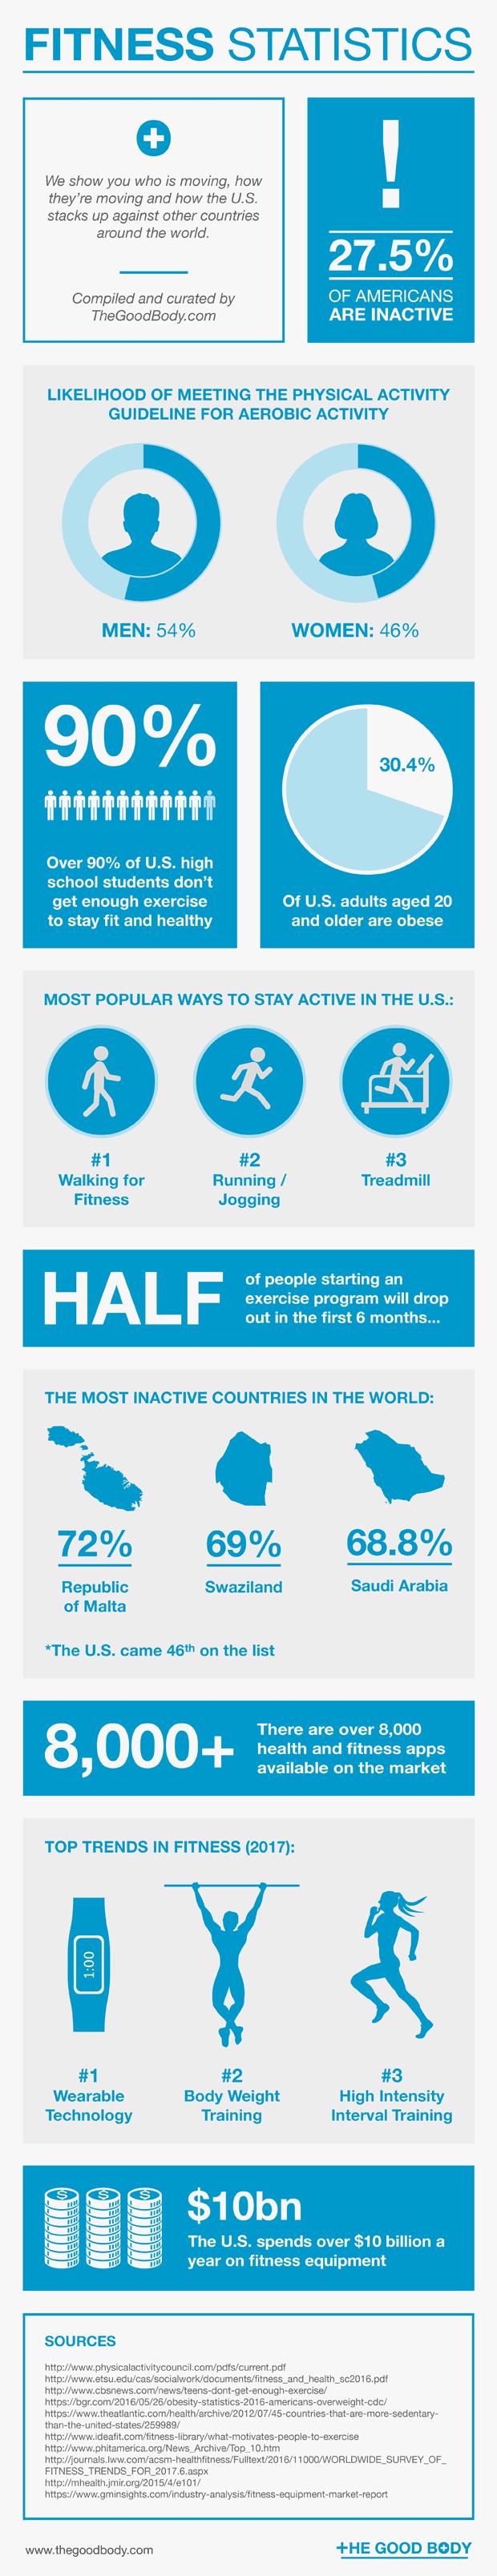 Fitness Statistics – infographic